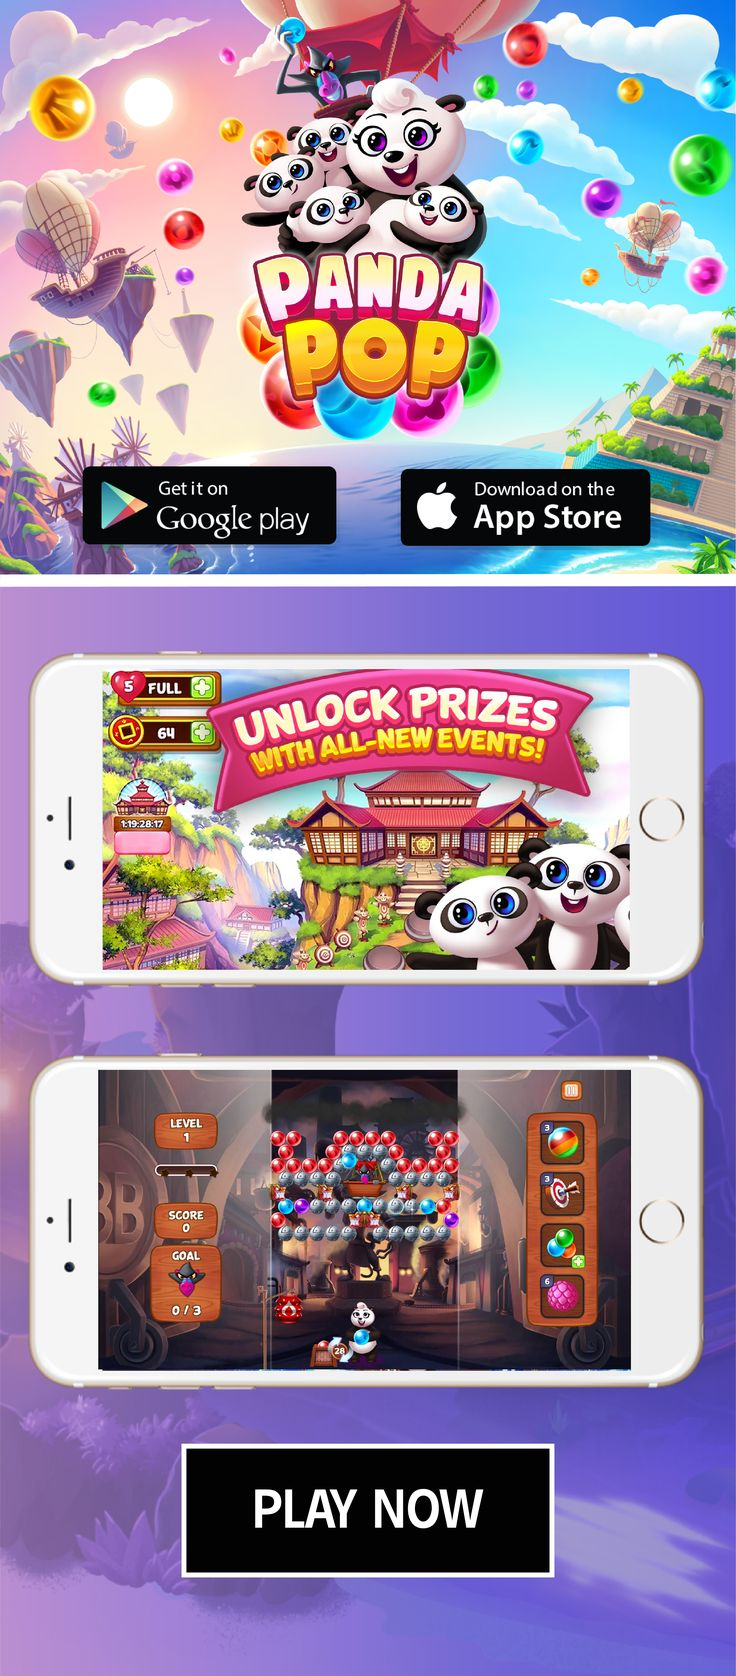 Play Panda Pop Now! Bubble shooter games, Bubble shooter